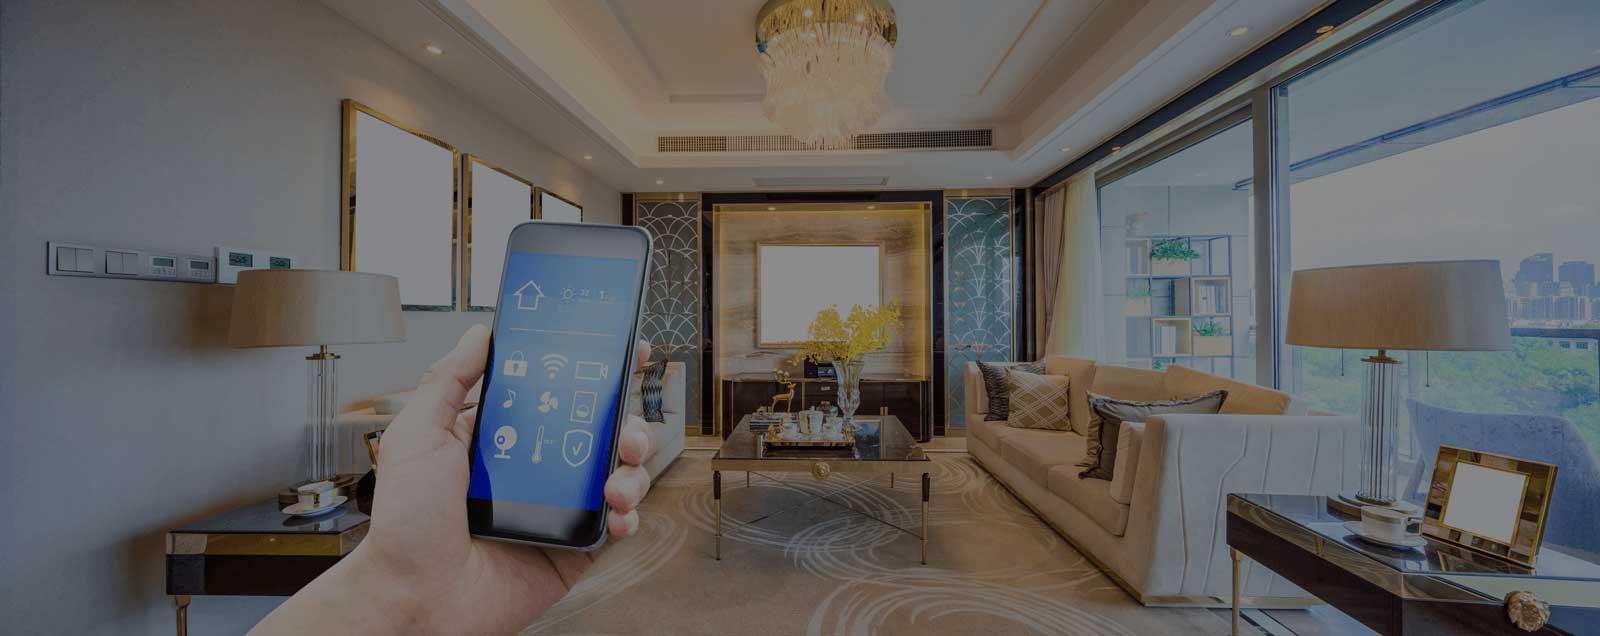 Smart Room Control for Hotels in Dubai, UAE